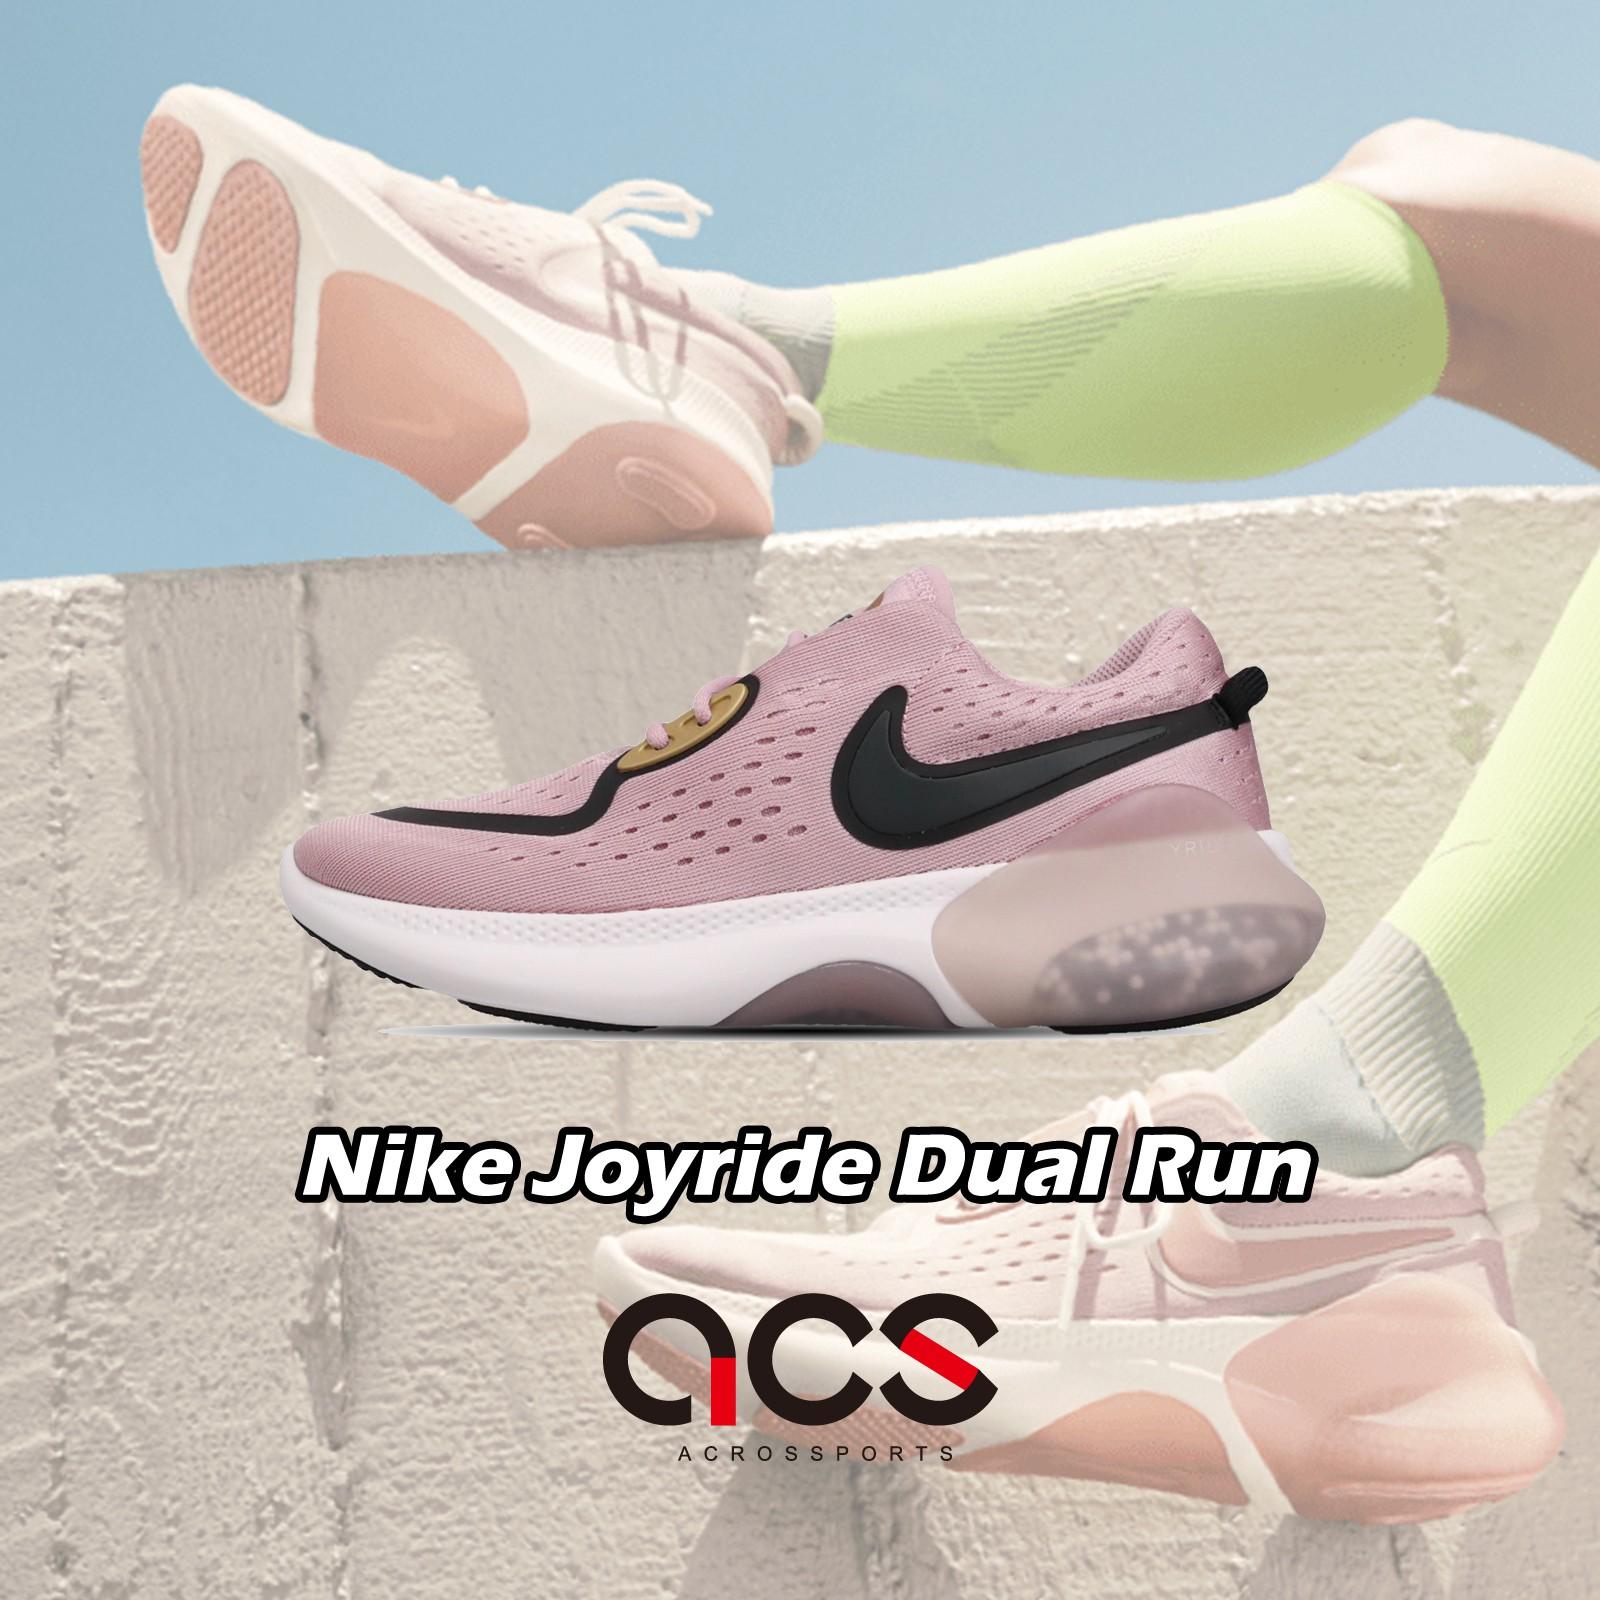 Nike 慢跑鞋 Wmns Joyride Dual Run 粉紅 黑 女鞋 運動鞋 CD4363-500 【ACS】